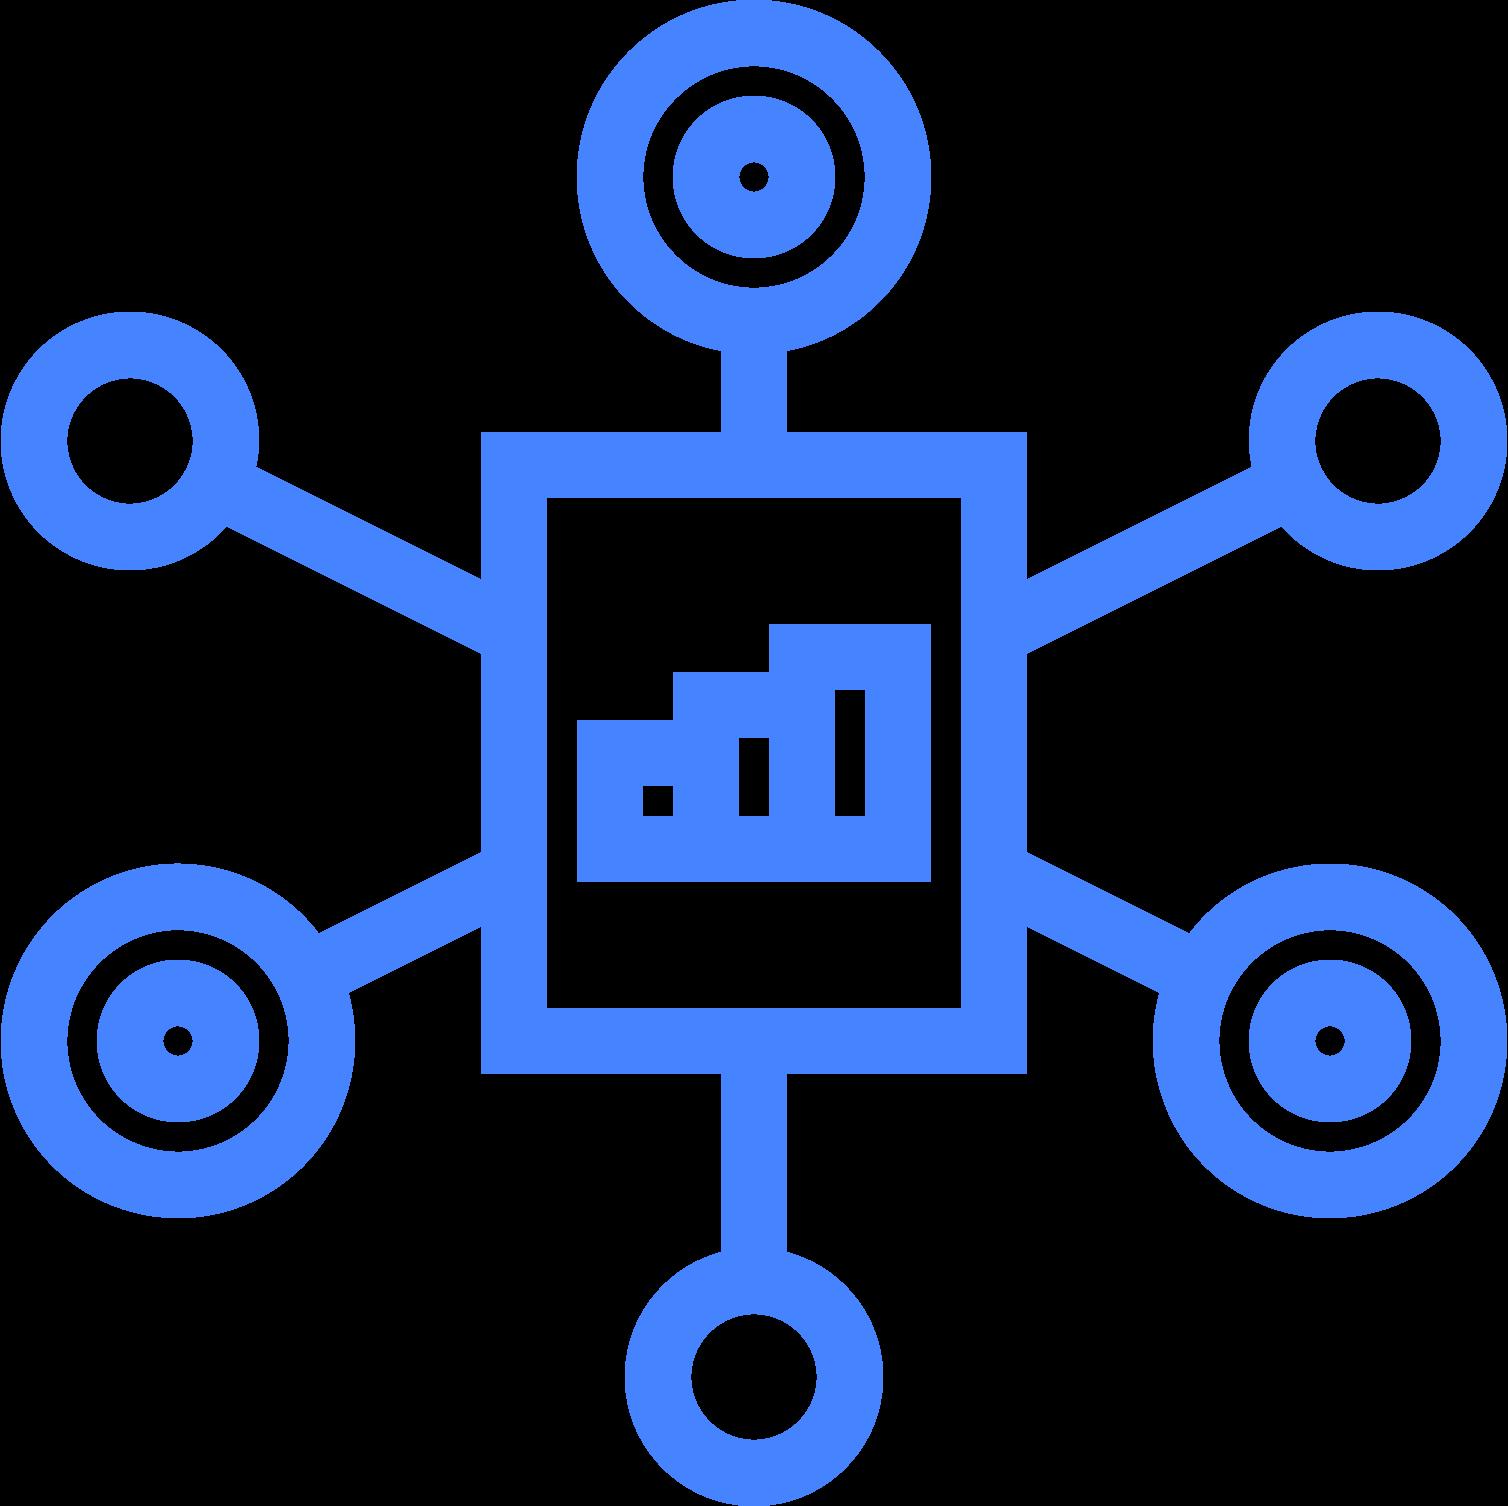 WhyUs_Framework_Icon